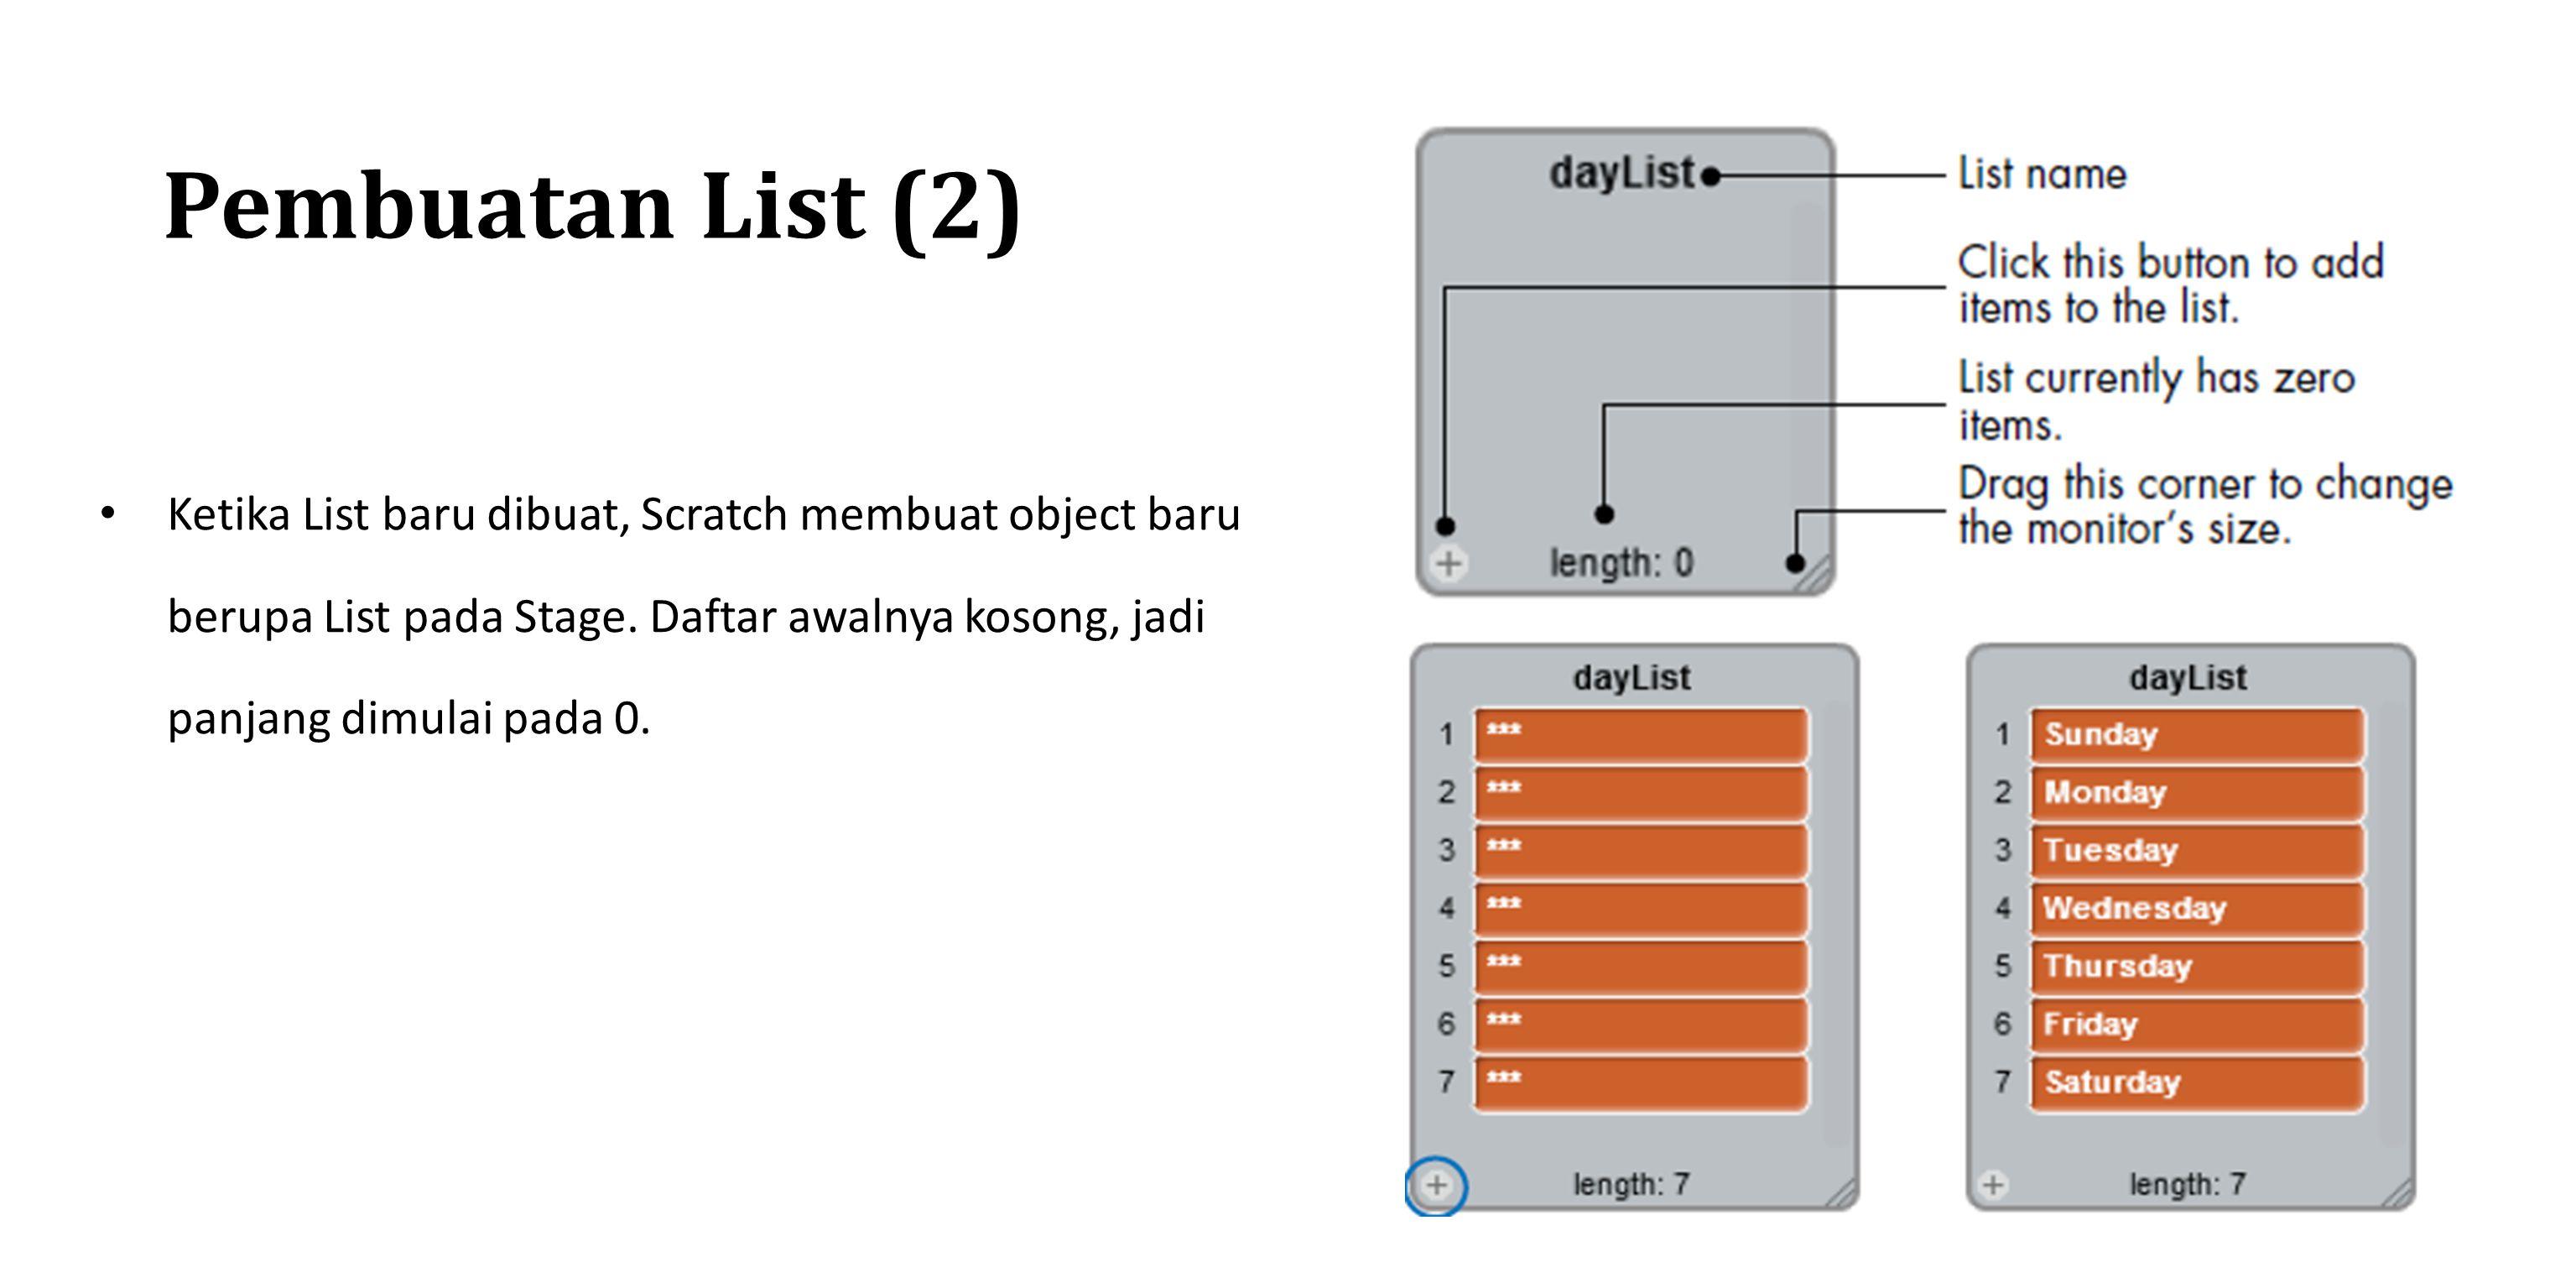 Pembuatan List (2) Ketika List baru dibuat, Scratch membuat object baru berupa List pada Stage. Daftar awalnya kosong, jadi panjang dimulai pada 0.